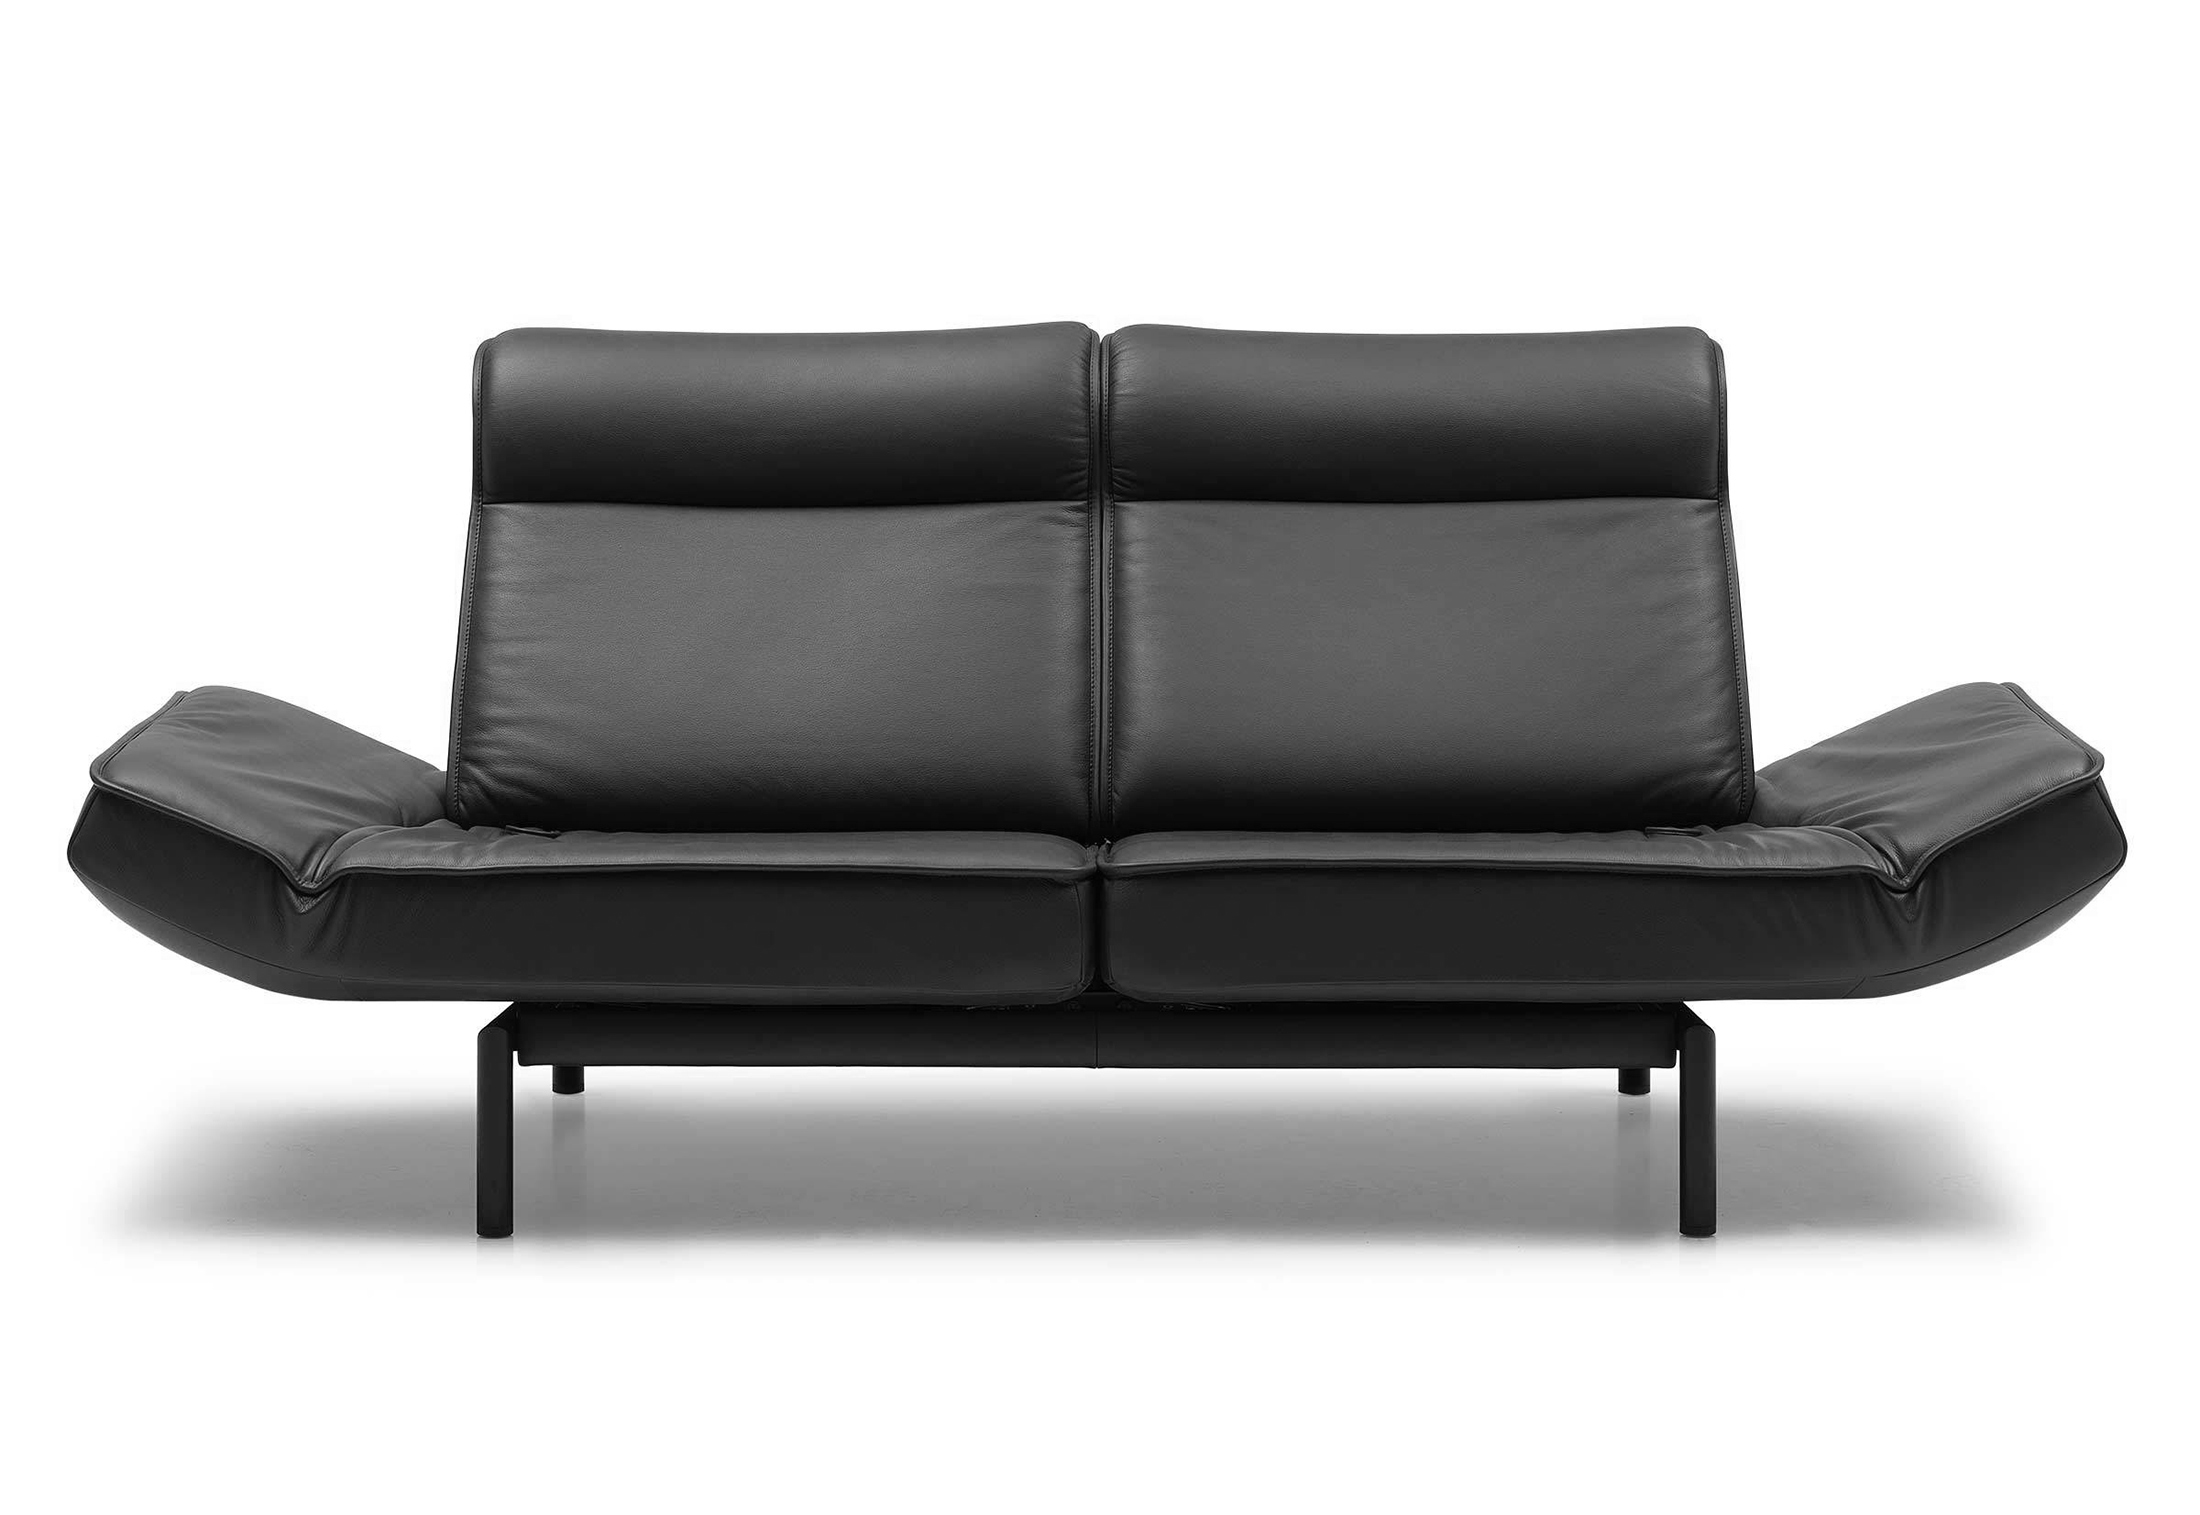 Full Size of De Sede Sofa Outlet Bed Usa Preisliste Furniture Uk Leder Gebraucht Kaufen Sleeper For Sale Sessel Schweiz Endless Ds 600 By Preis 47 450 Stylepark Antik L Sofa De Sede Sofa